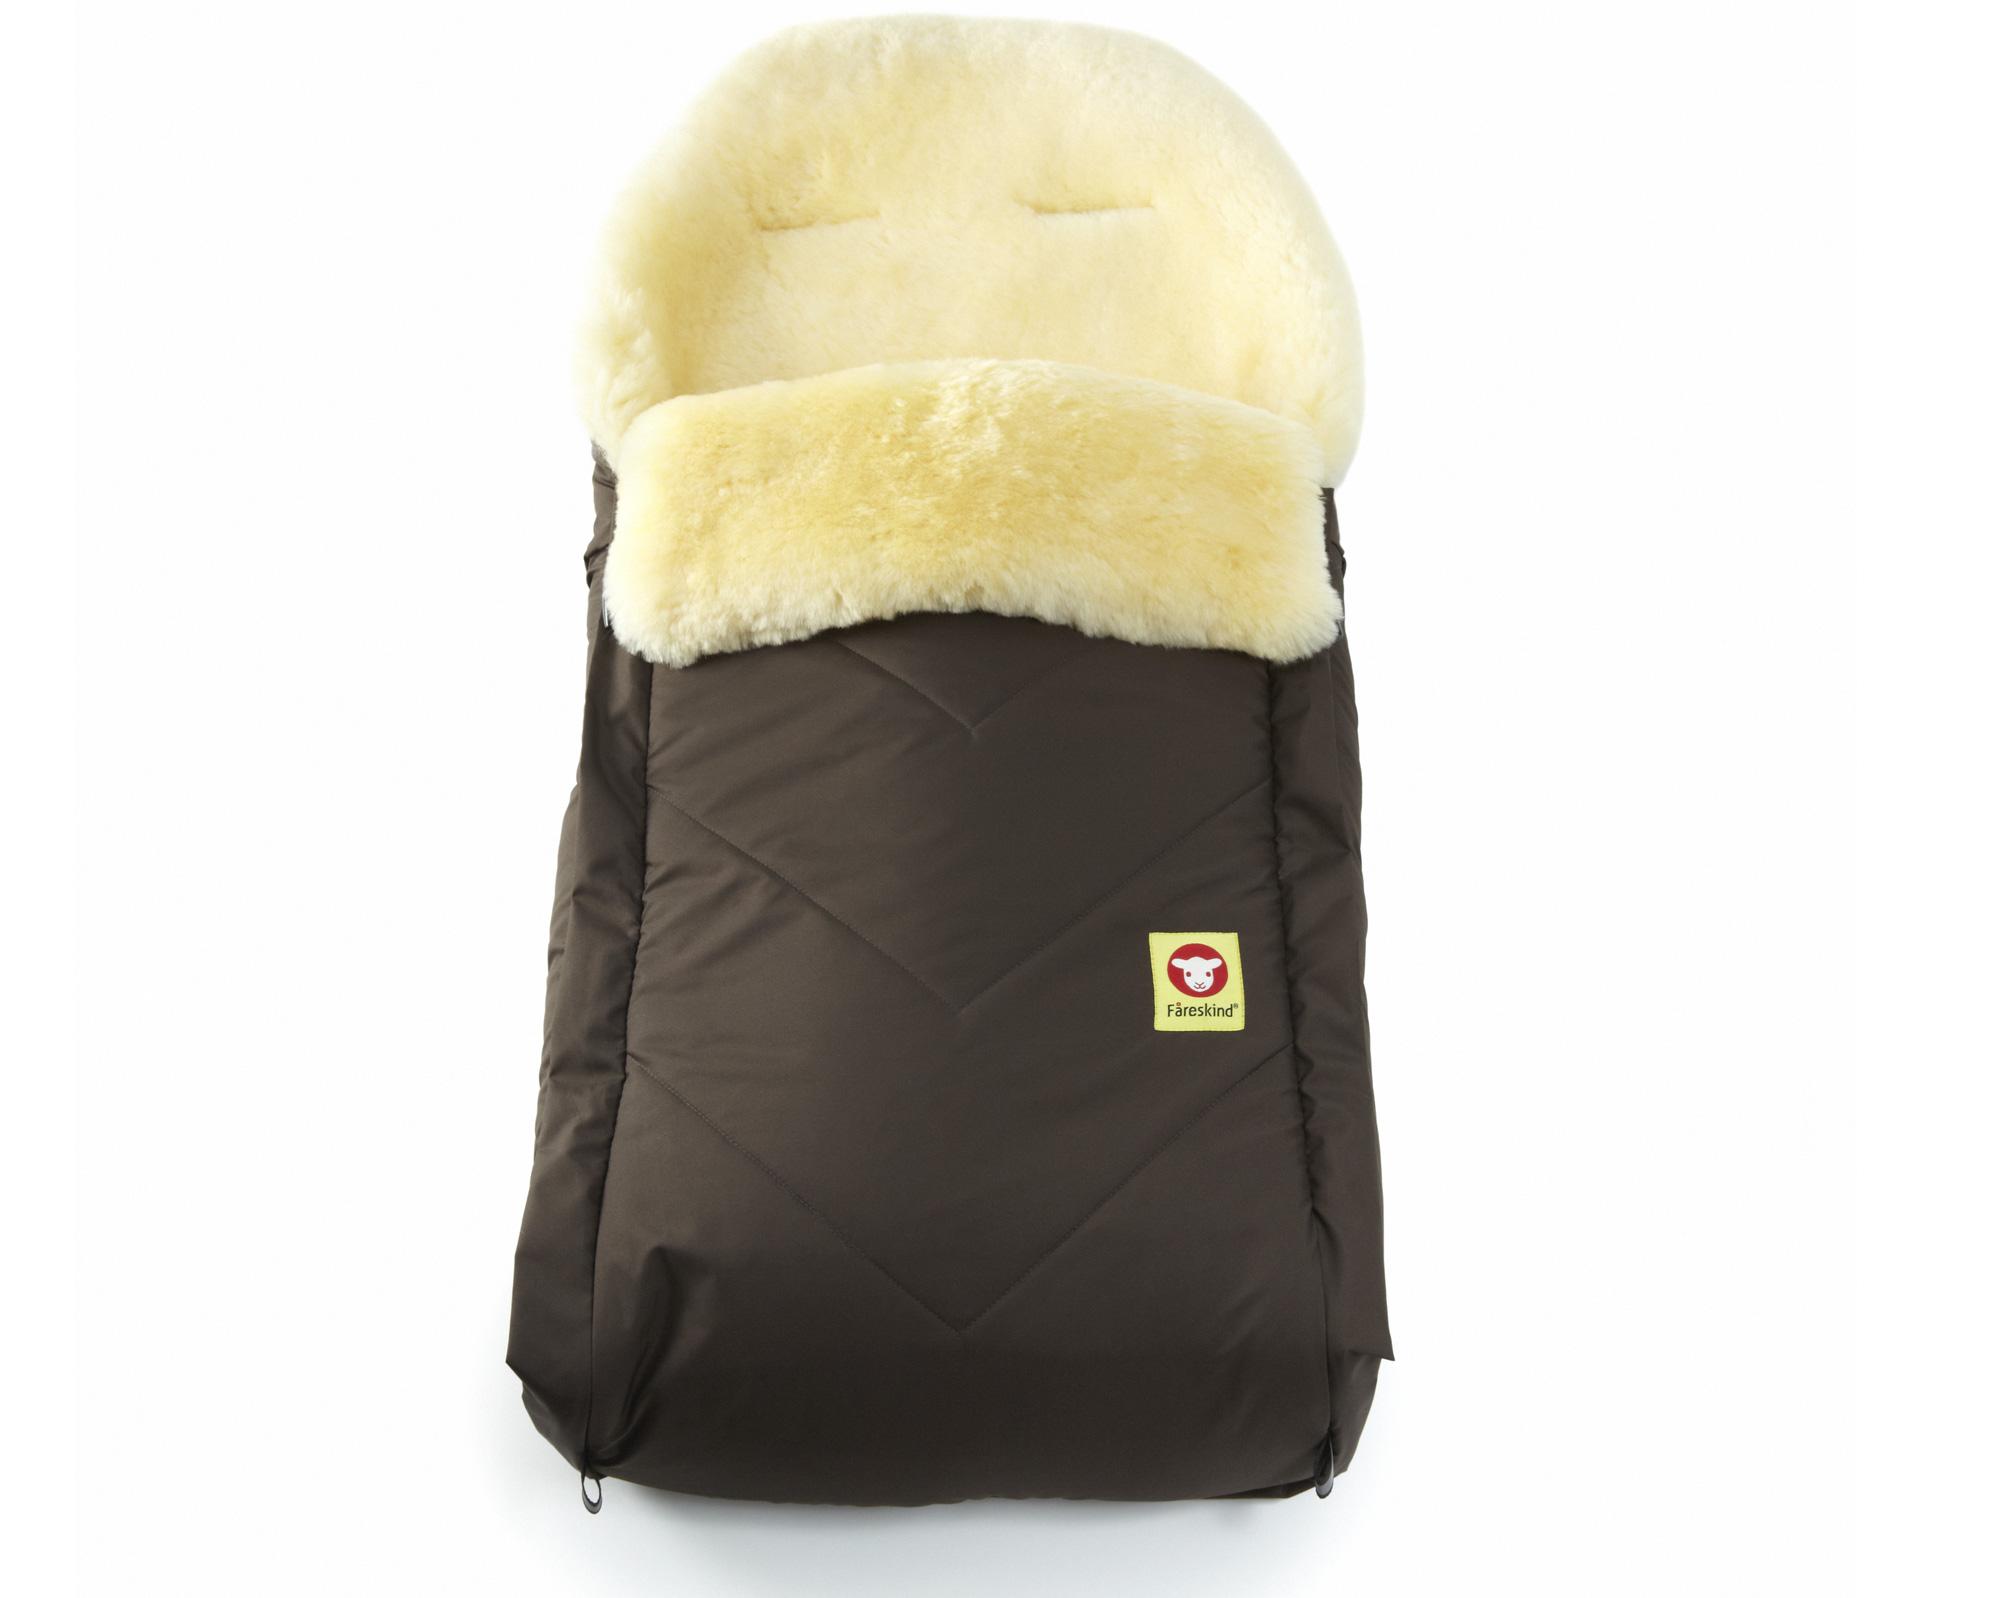 a9174107ed34 Baby Go Comfy - Fareskind Baby Bunting Bag